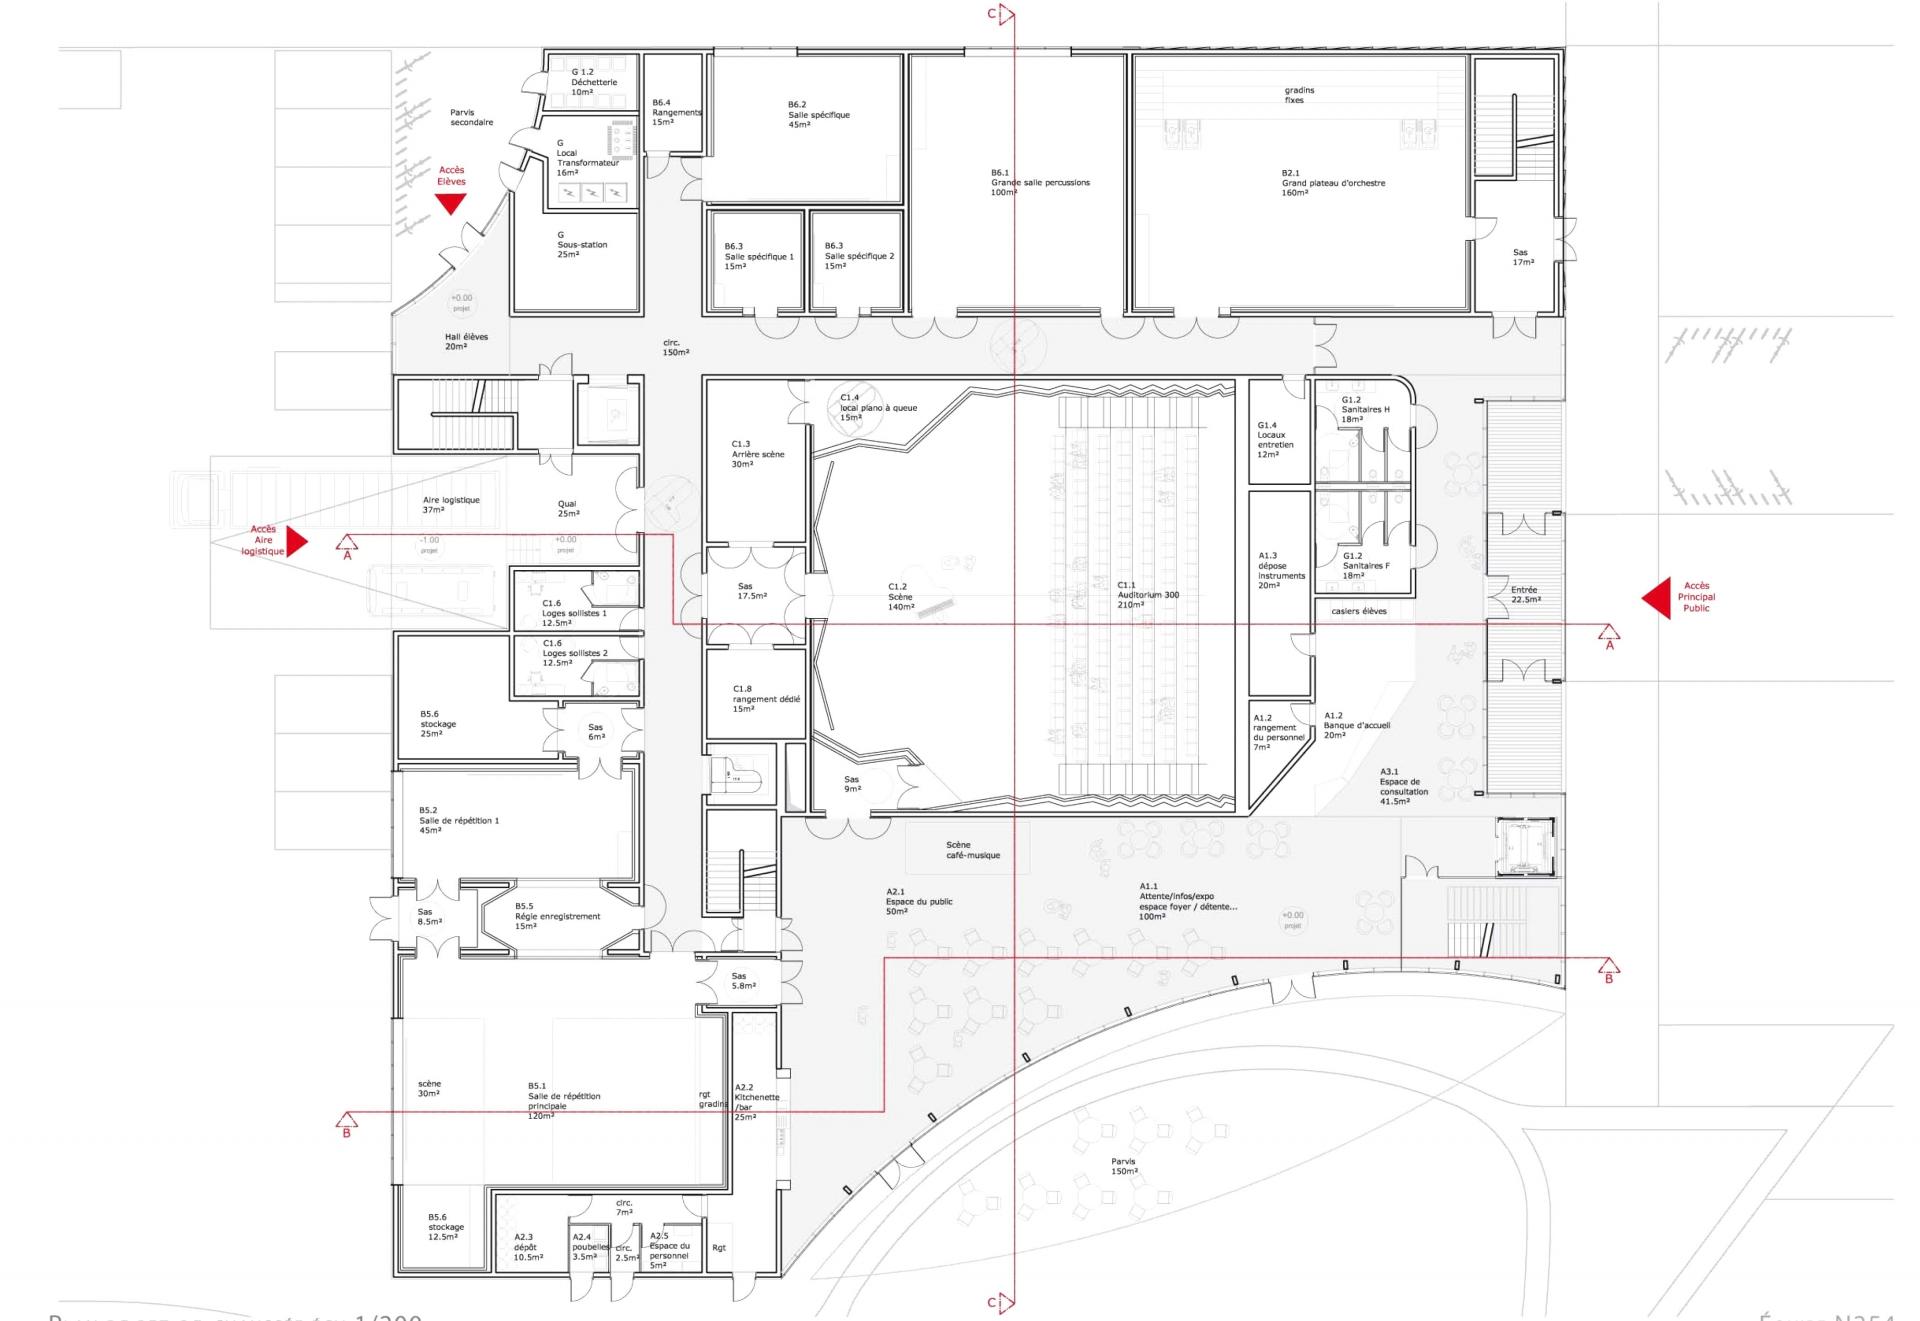 Conservatoire - Plan 1 ©Tetrarc